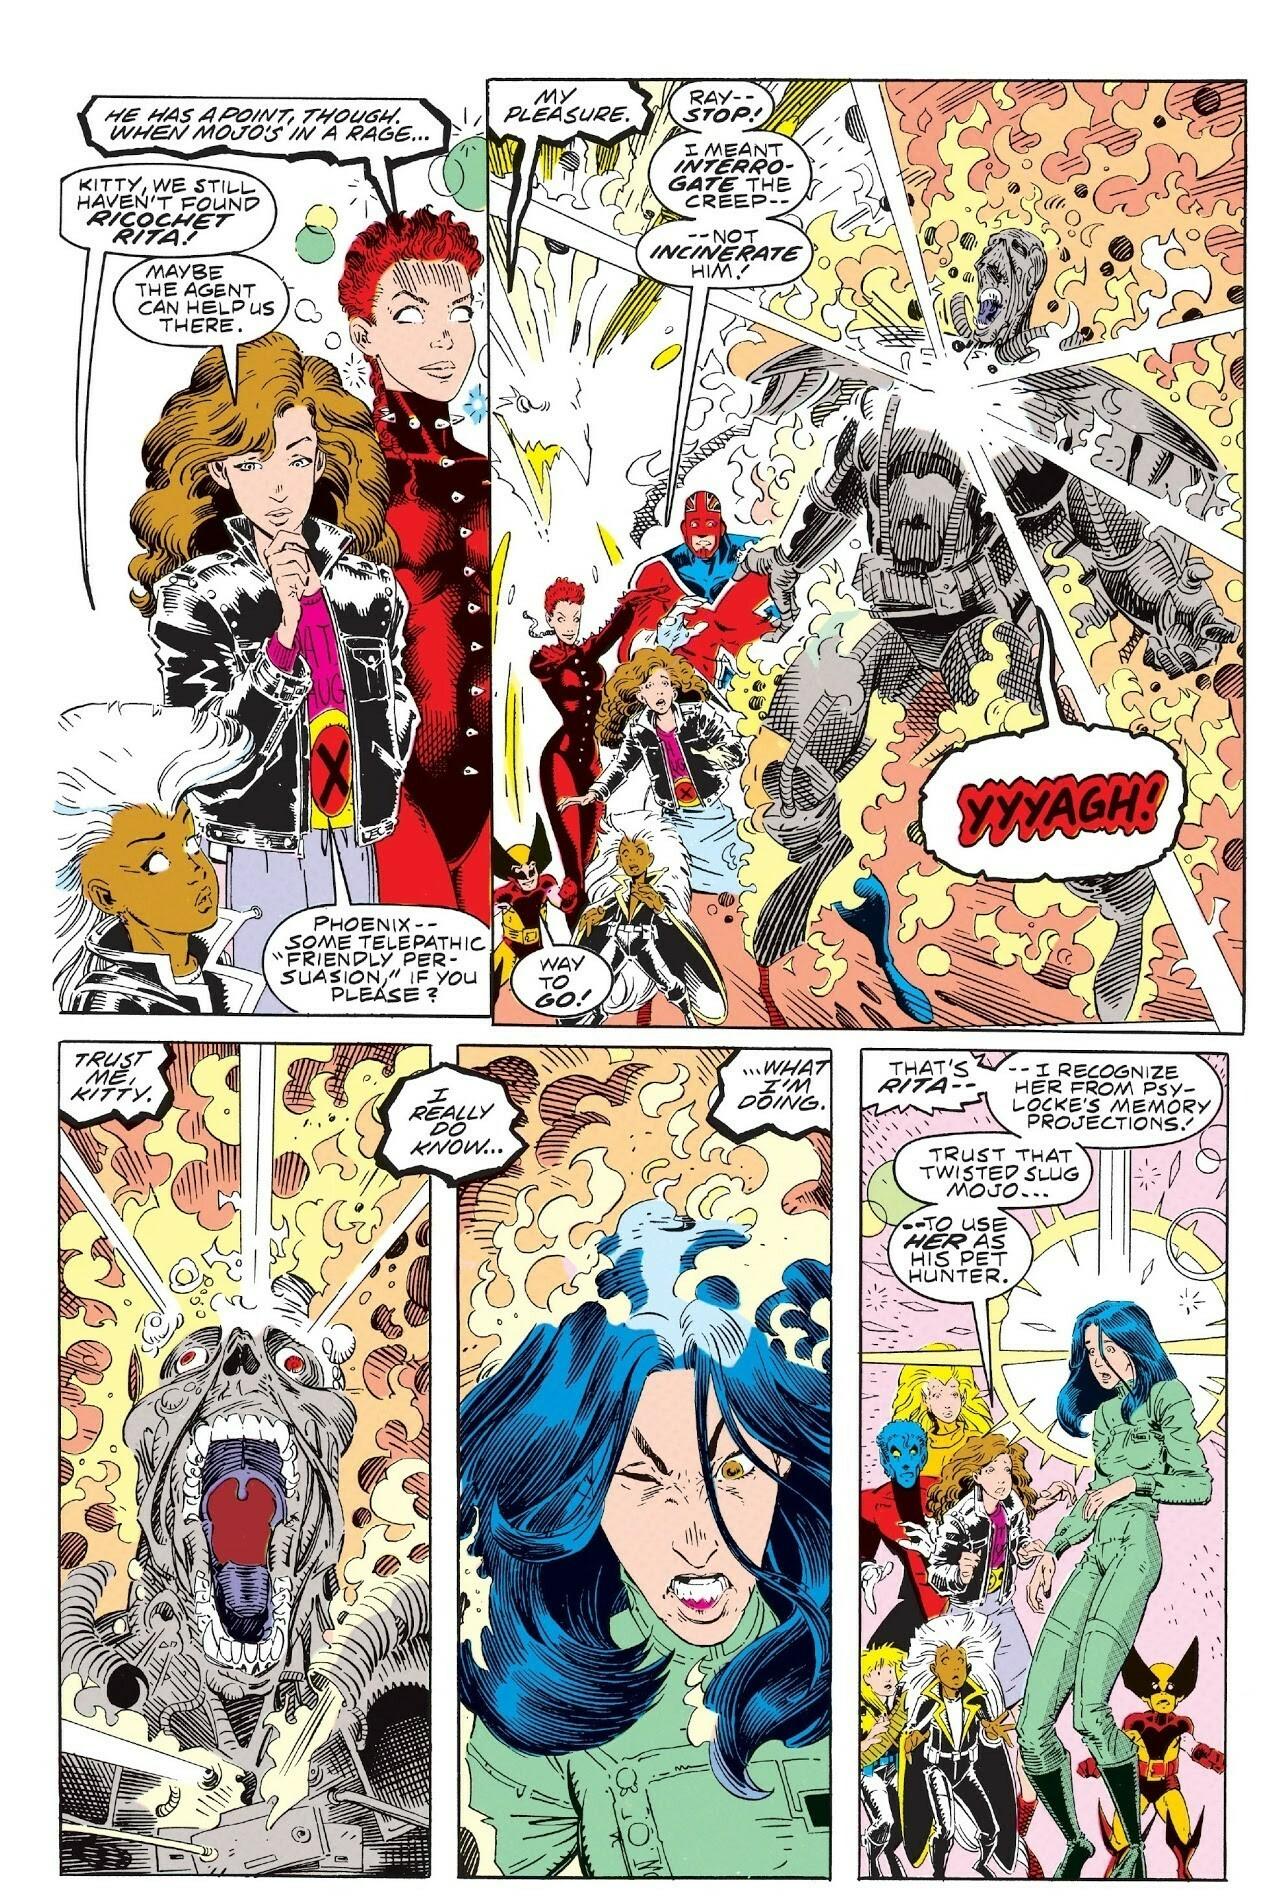 Reverses Mojo's body modifications to Rita Wayword that turned her into his interdimensional hunter - Excalibur Mojo Mayhem